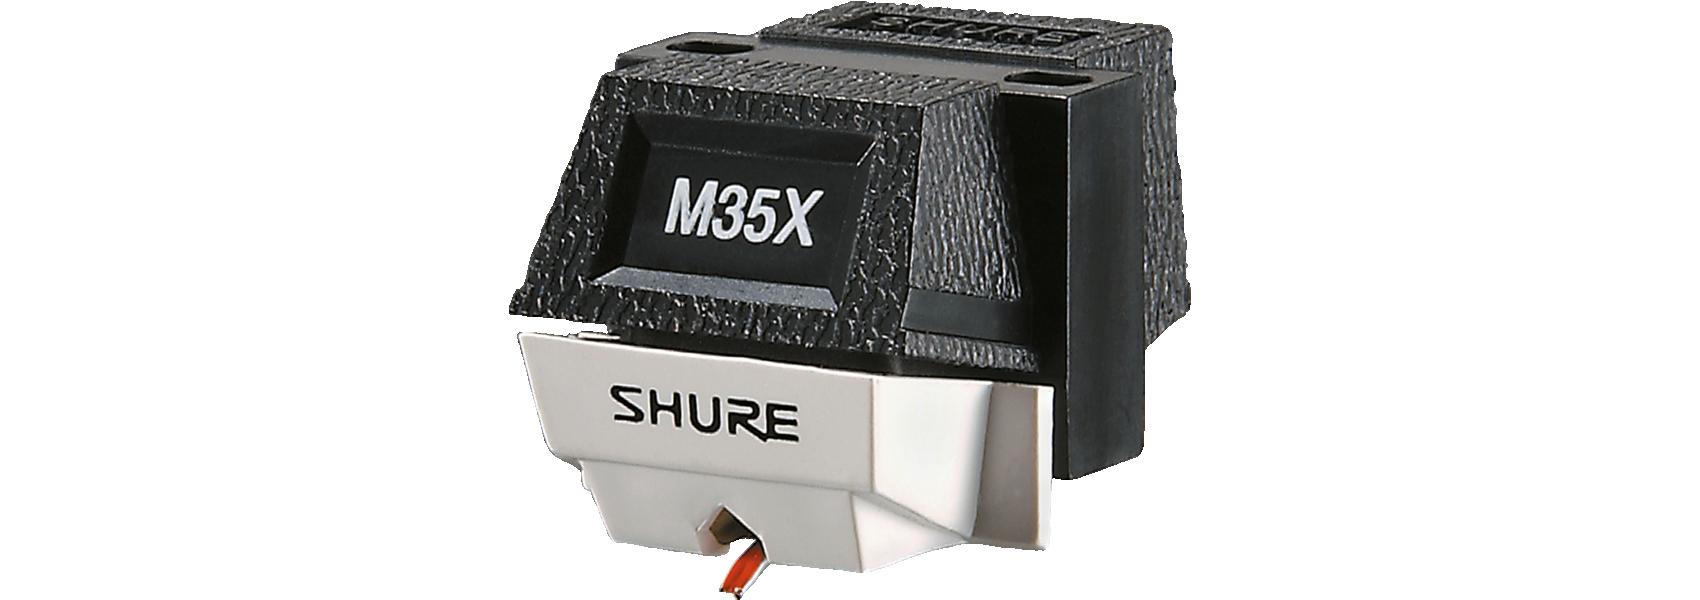 Ilustración Shure M35X Cápsula de tocadiscos para DJ